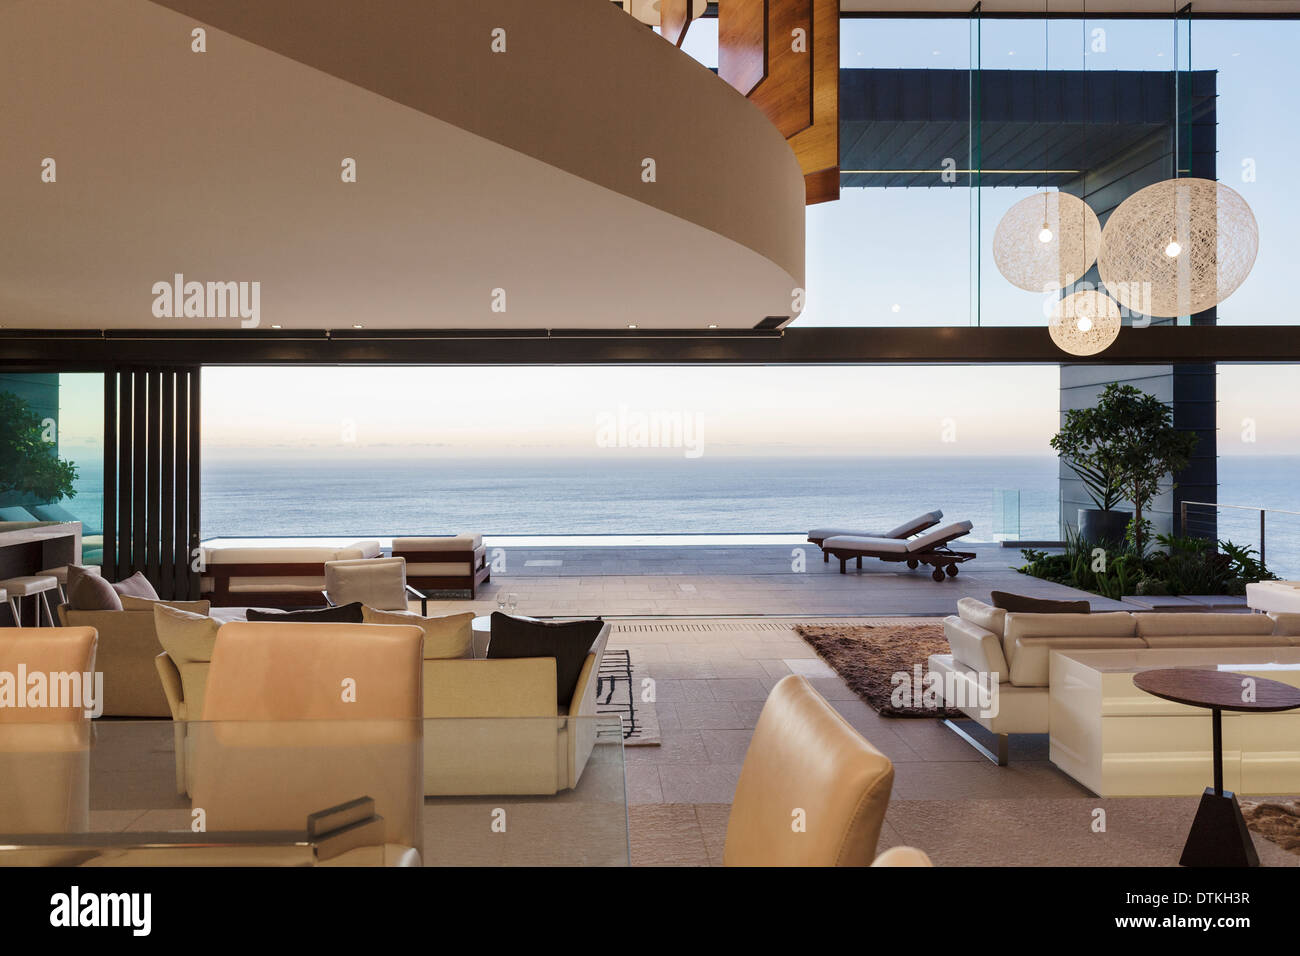 https://c8.alamy.com/comp/DTKH3R/modern-living-room-overlooking-ocean-at-sunset-DTKH3R.jpg